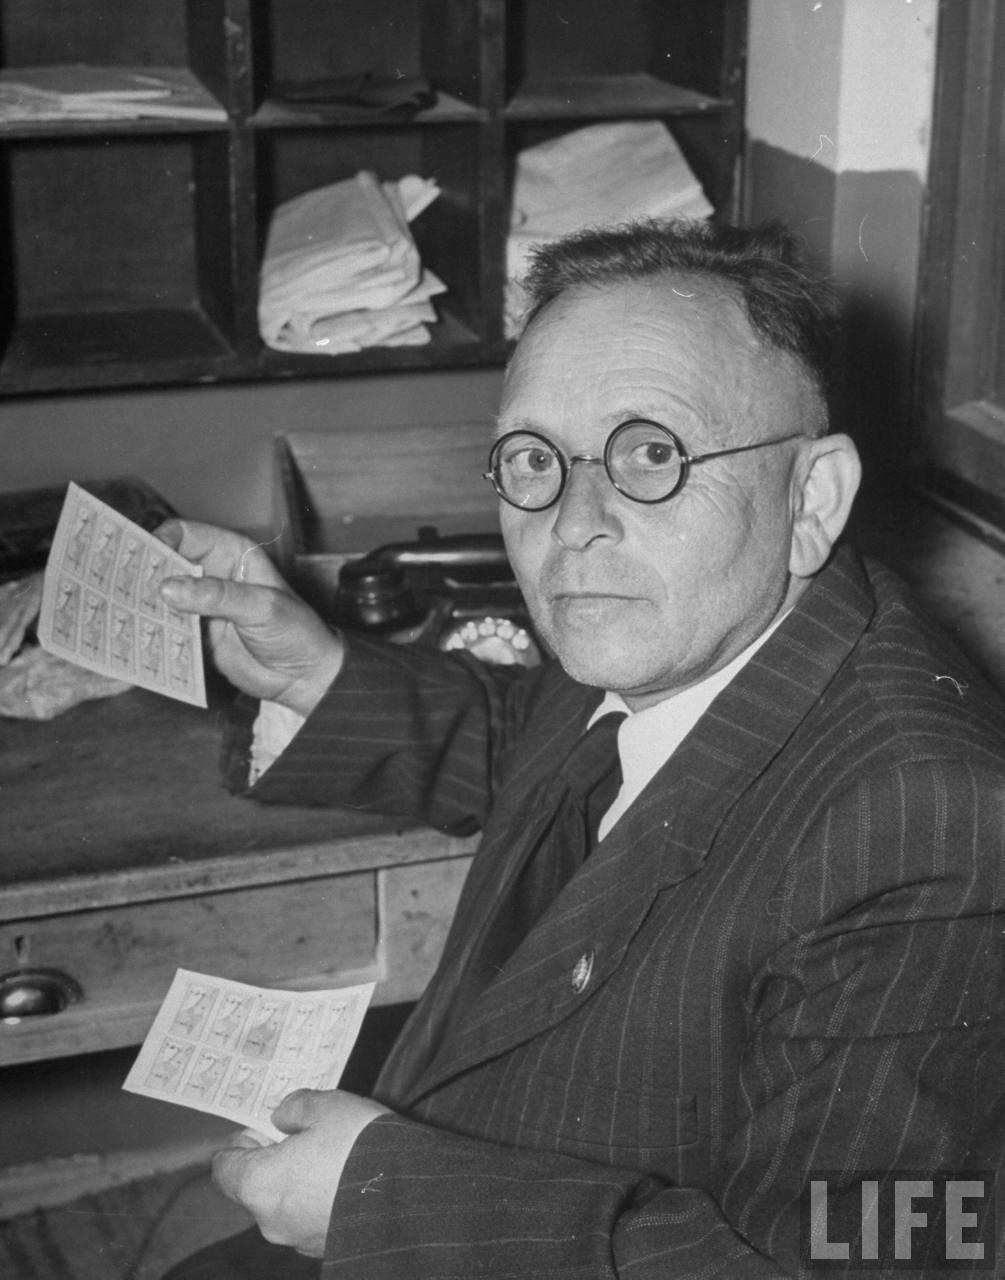 1948. Почтмейстер Александр Нейгер с образцами новых марок